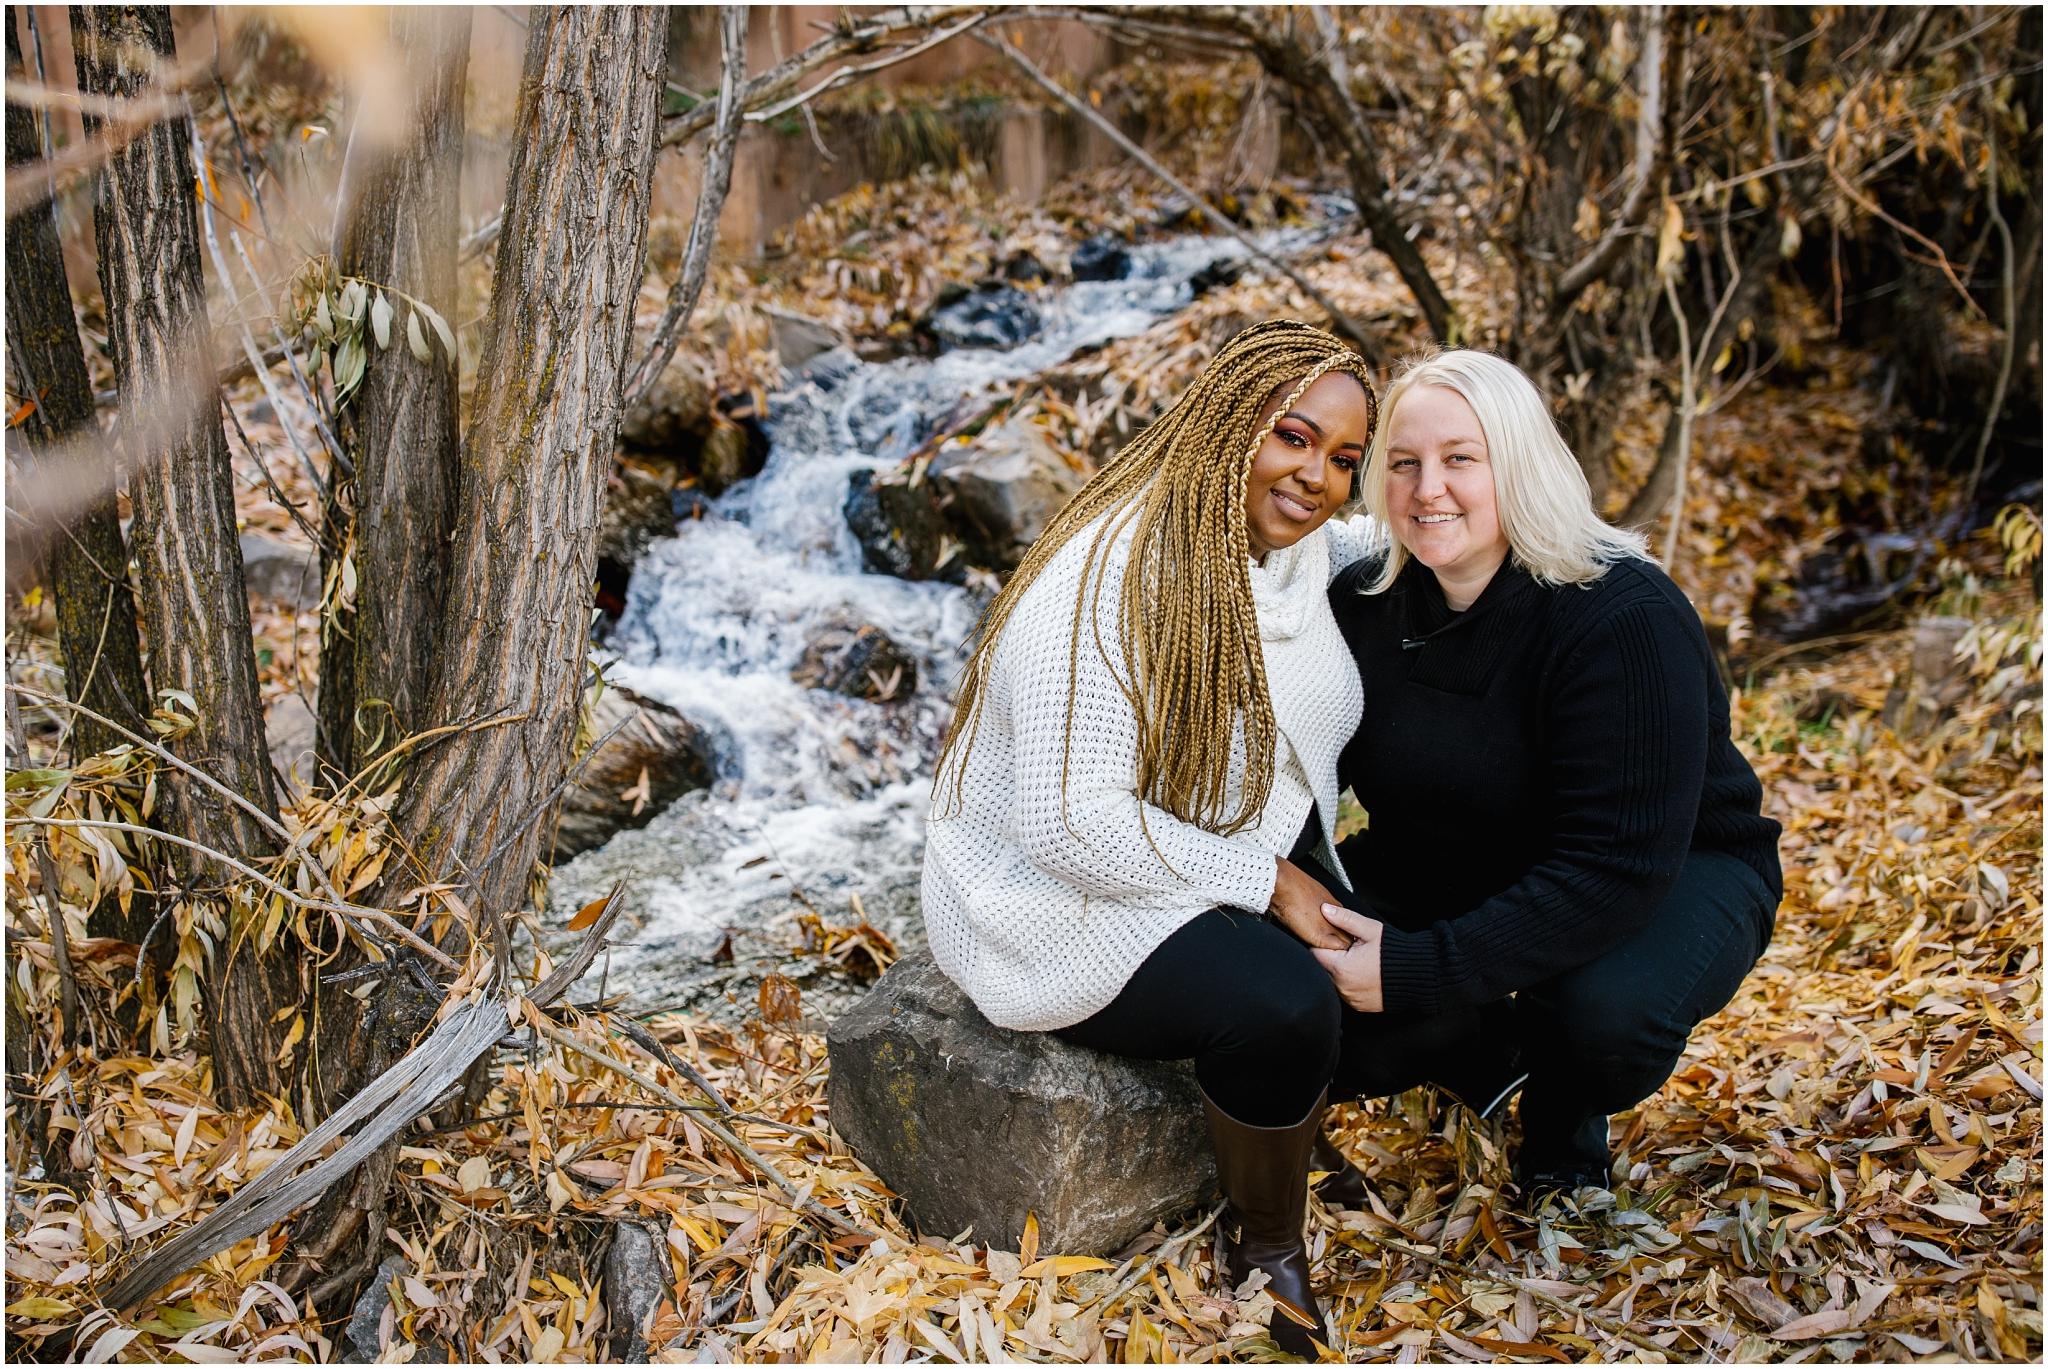 LisaTiffany2018-89_Lizzie-B-Imagery-Utah-Family-Photographer-Salt-Lake-City-Park-City-Miners-Hospital-Community-Center.jpg